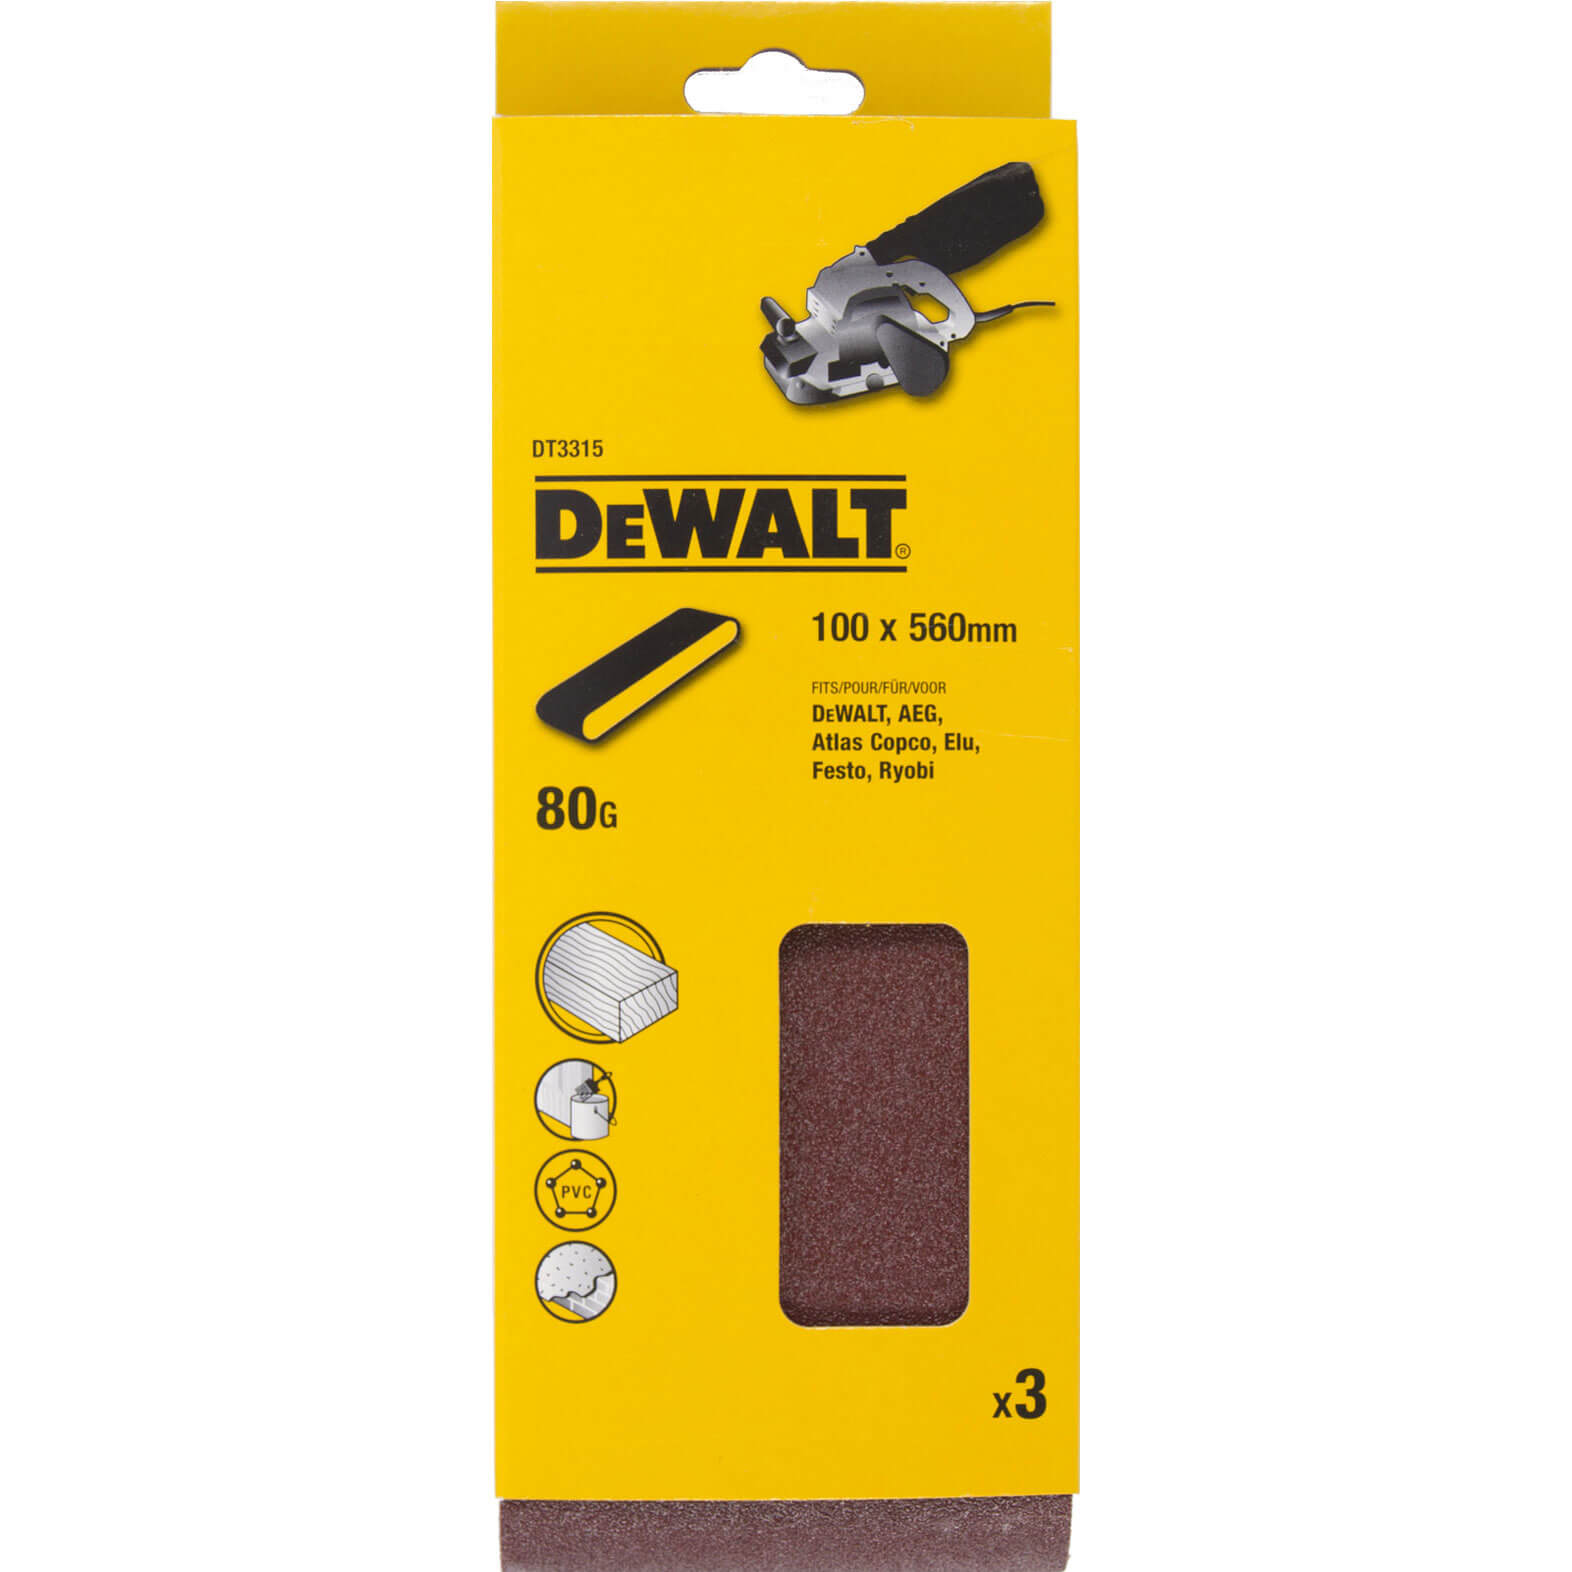 Image of DeWalt 100 x 560mm Multi Purpose Sanding Belts 100mm x 560mm 80g Pack of 3